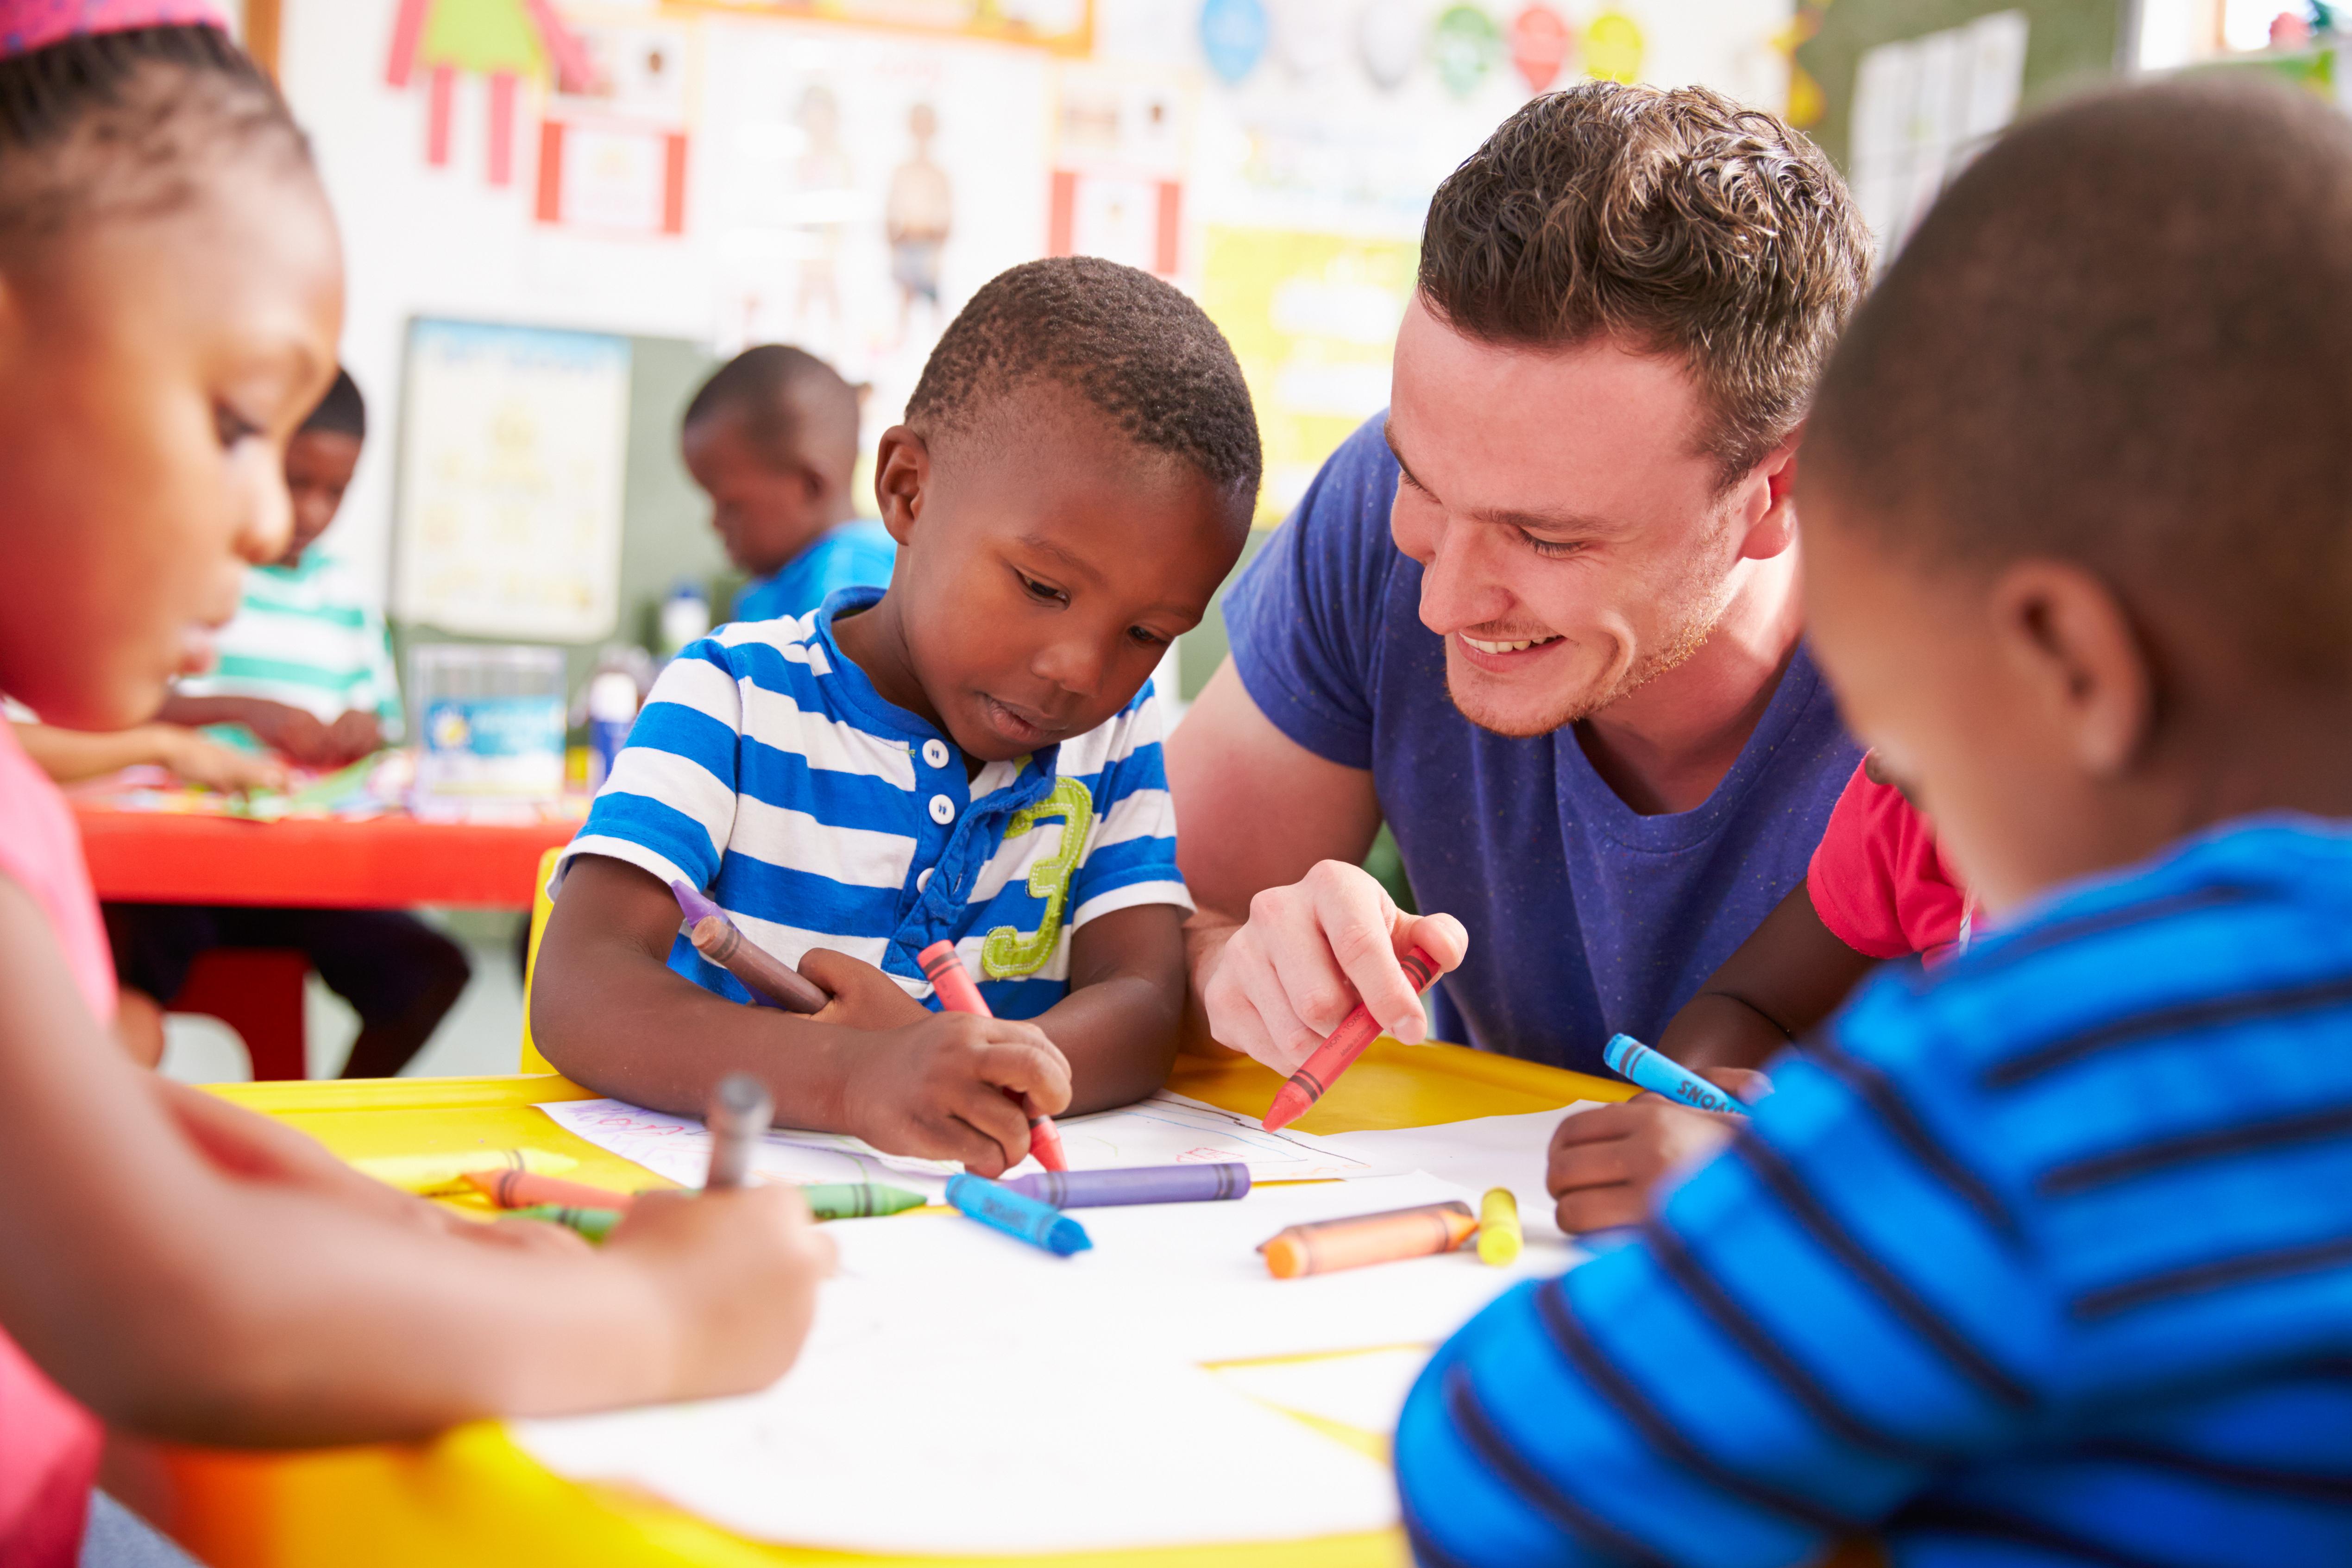 Saint Paul Lutheran School Westlake Ohio Programs And Services Achievement Centers For Children